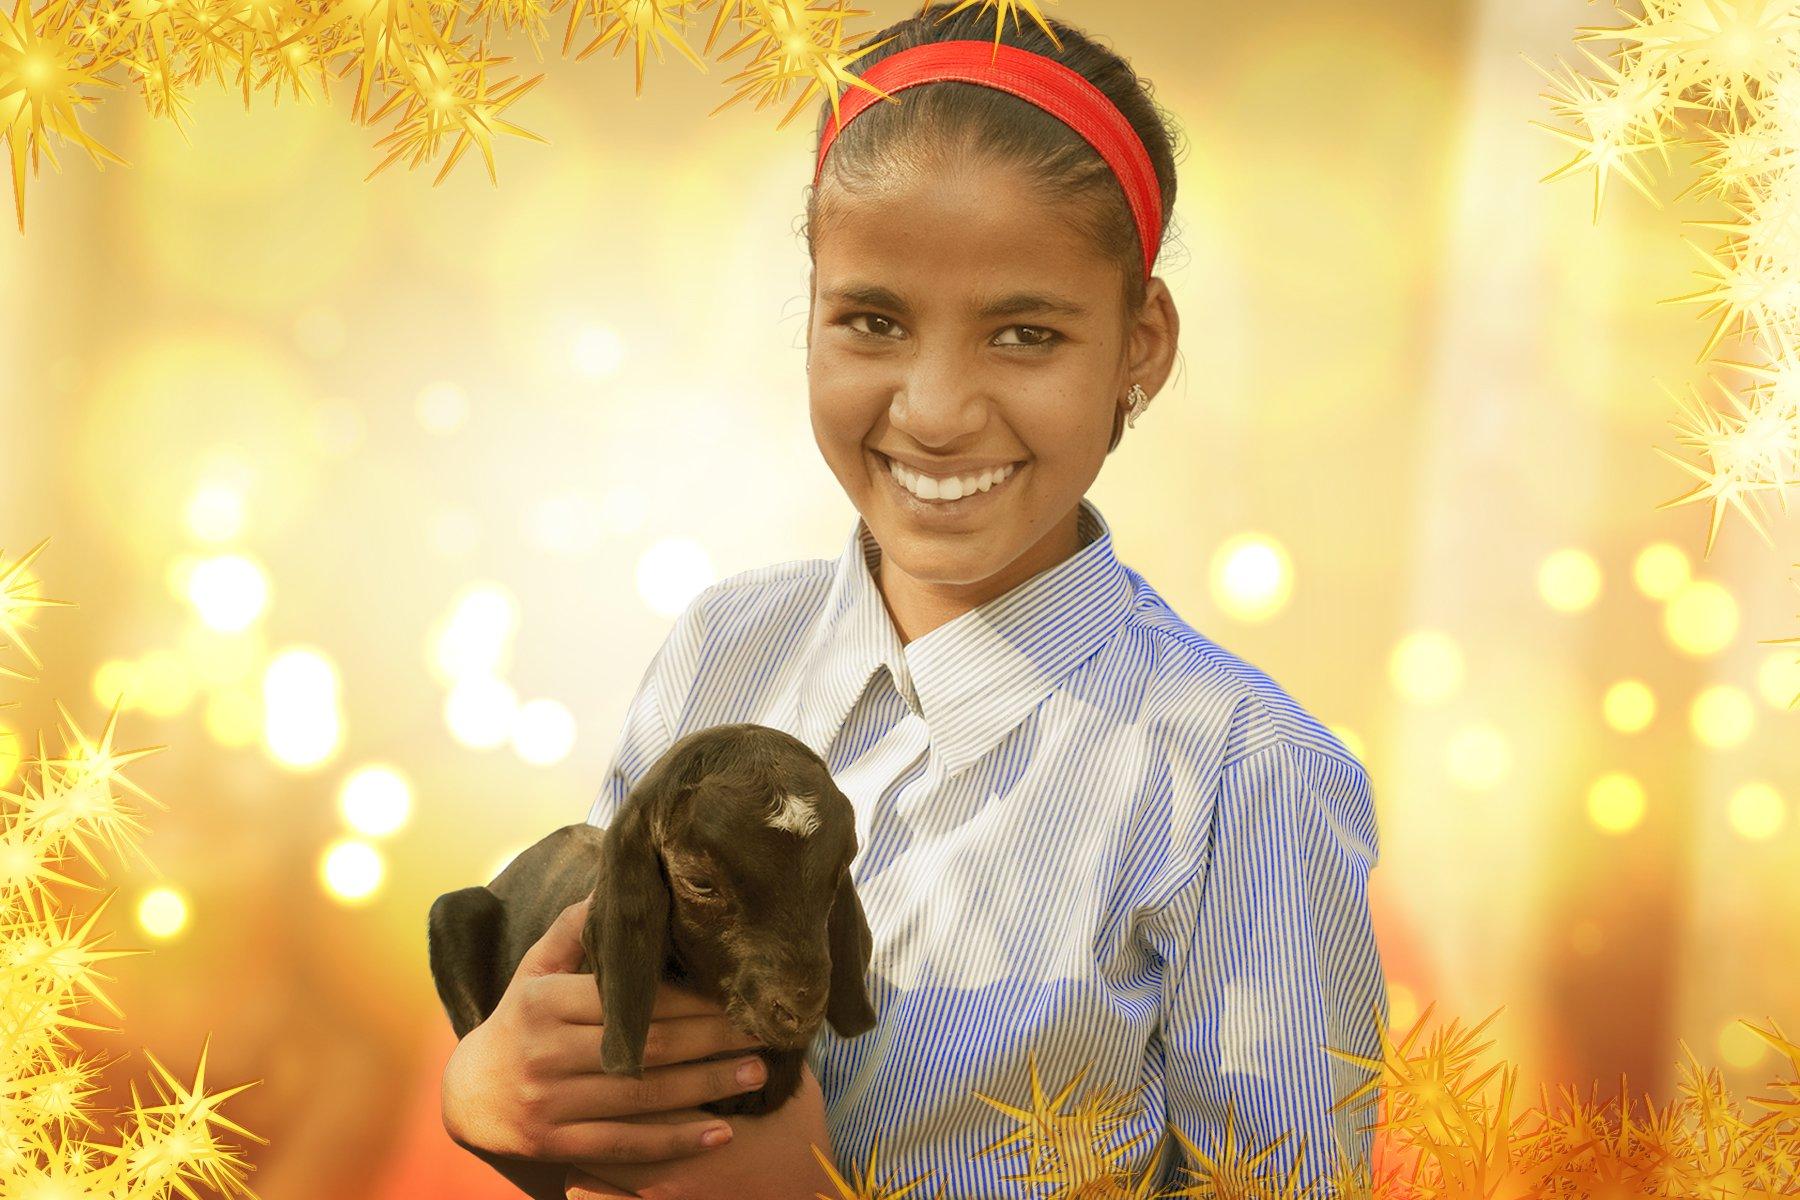 13-11-girl-with-baby-goat.jpg